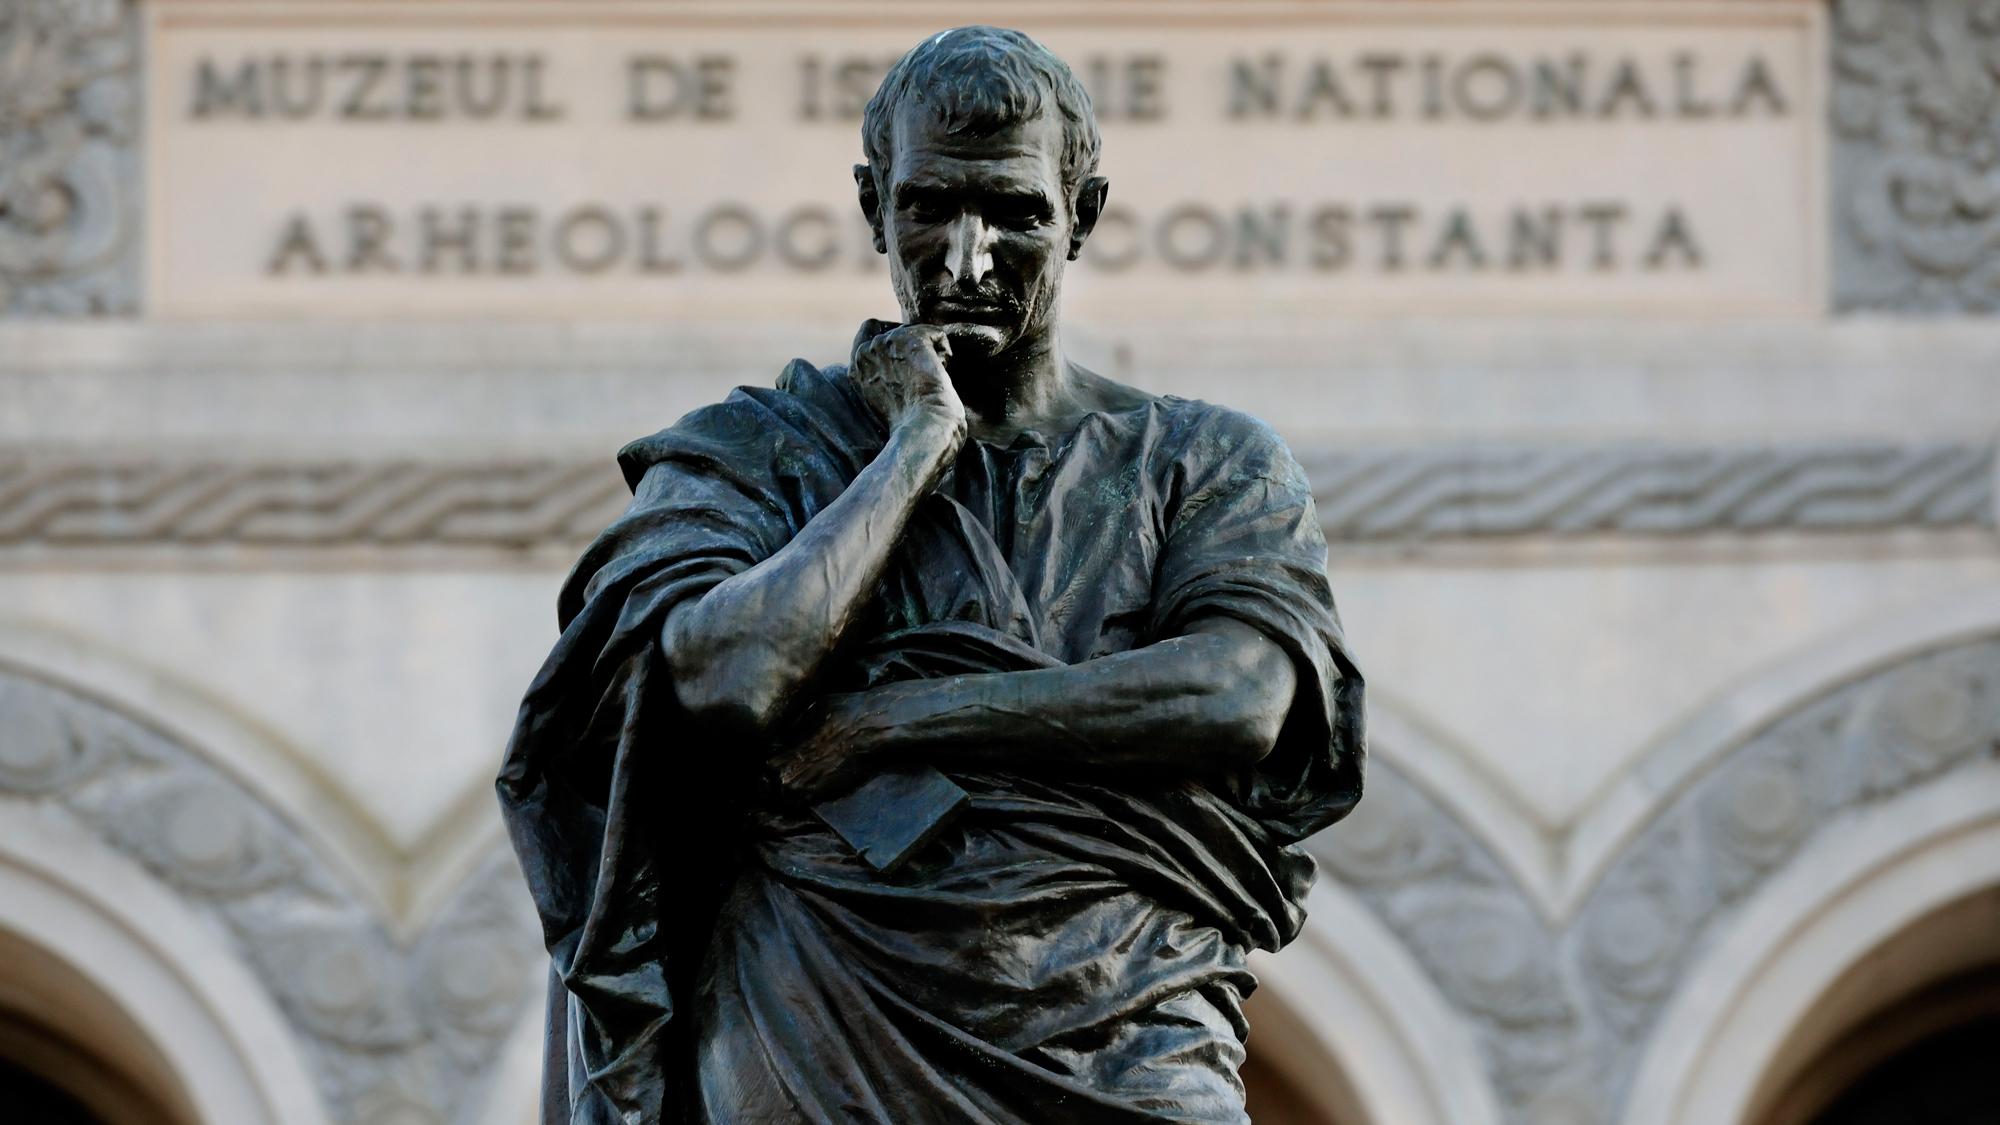 Publio Ovidio Nasón (latín: Publius Ovidius Naso; Sulmona, 20 de ...